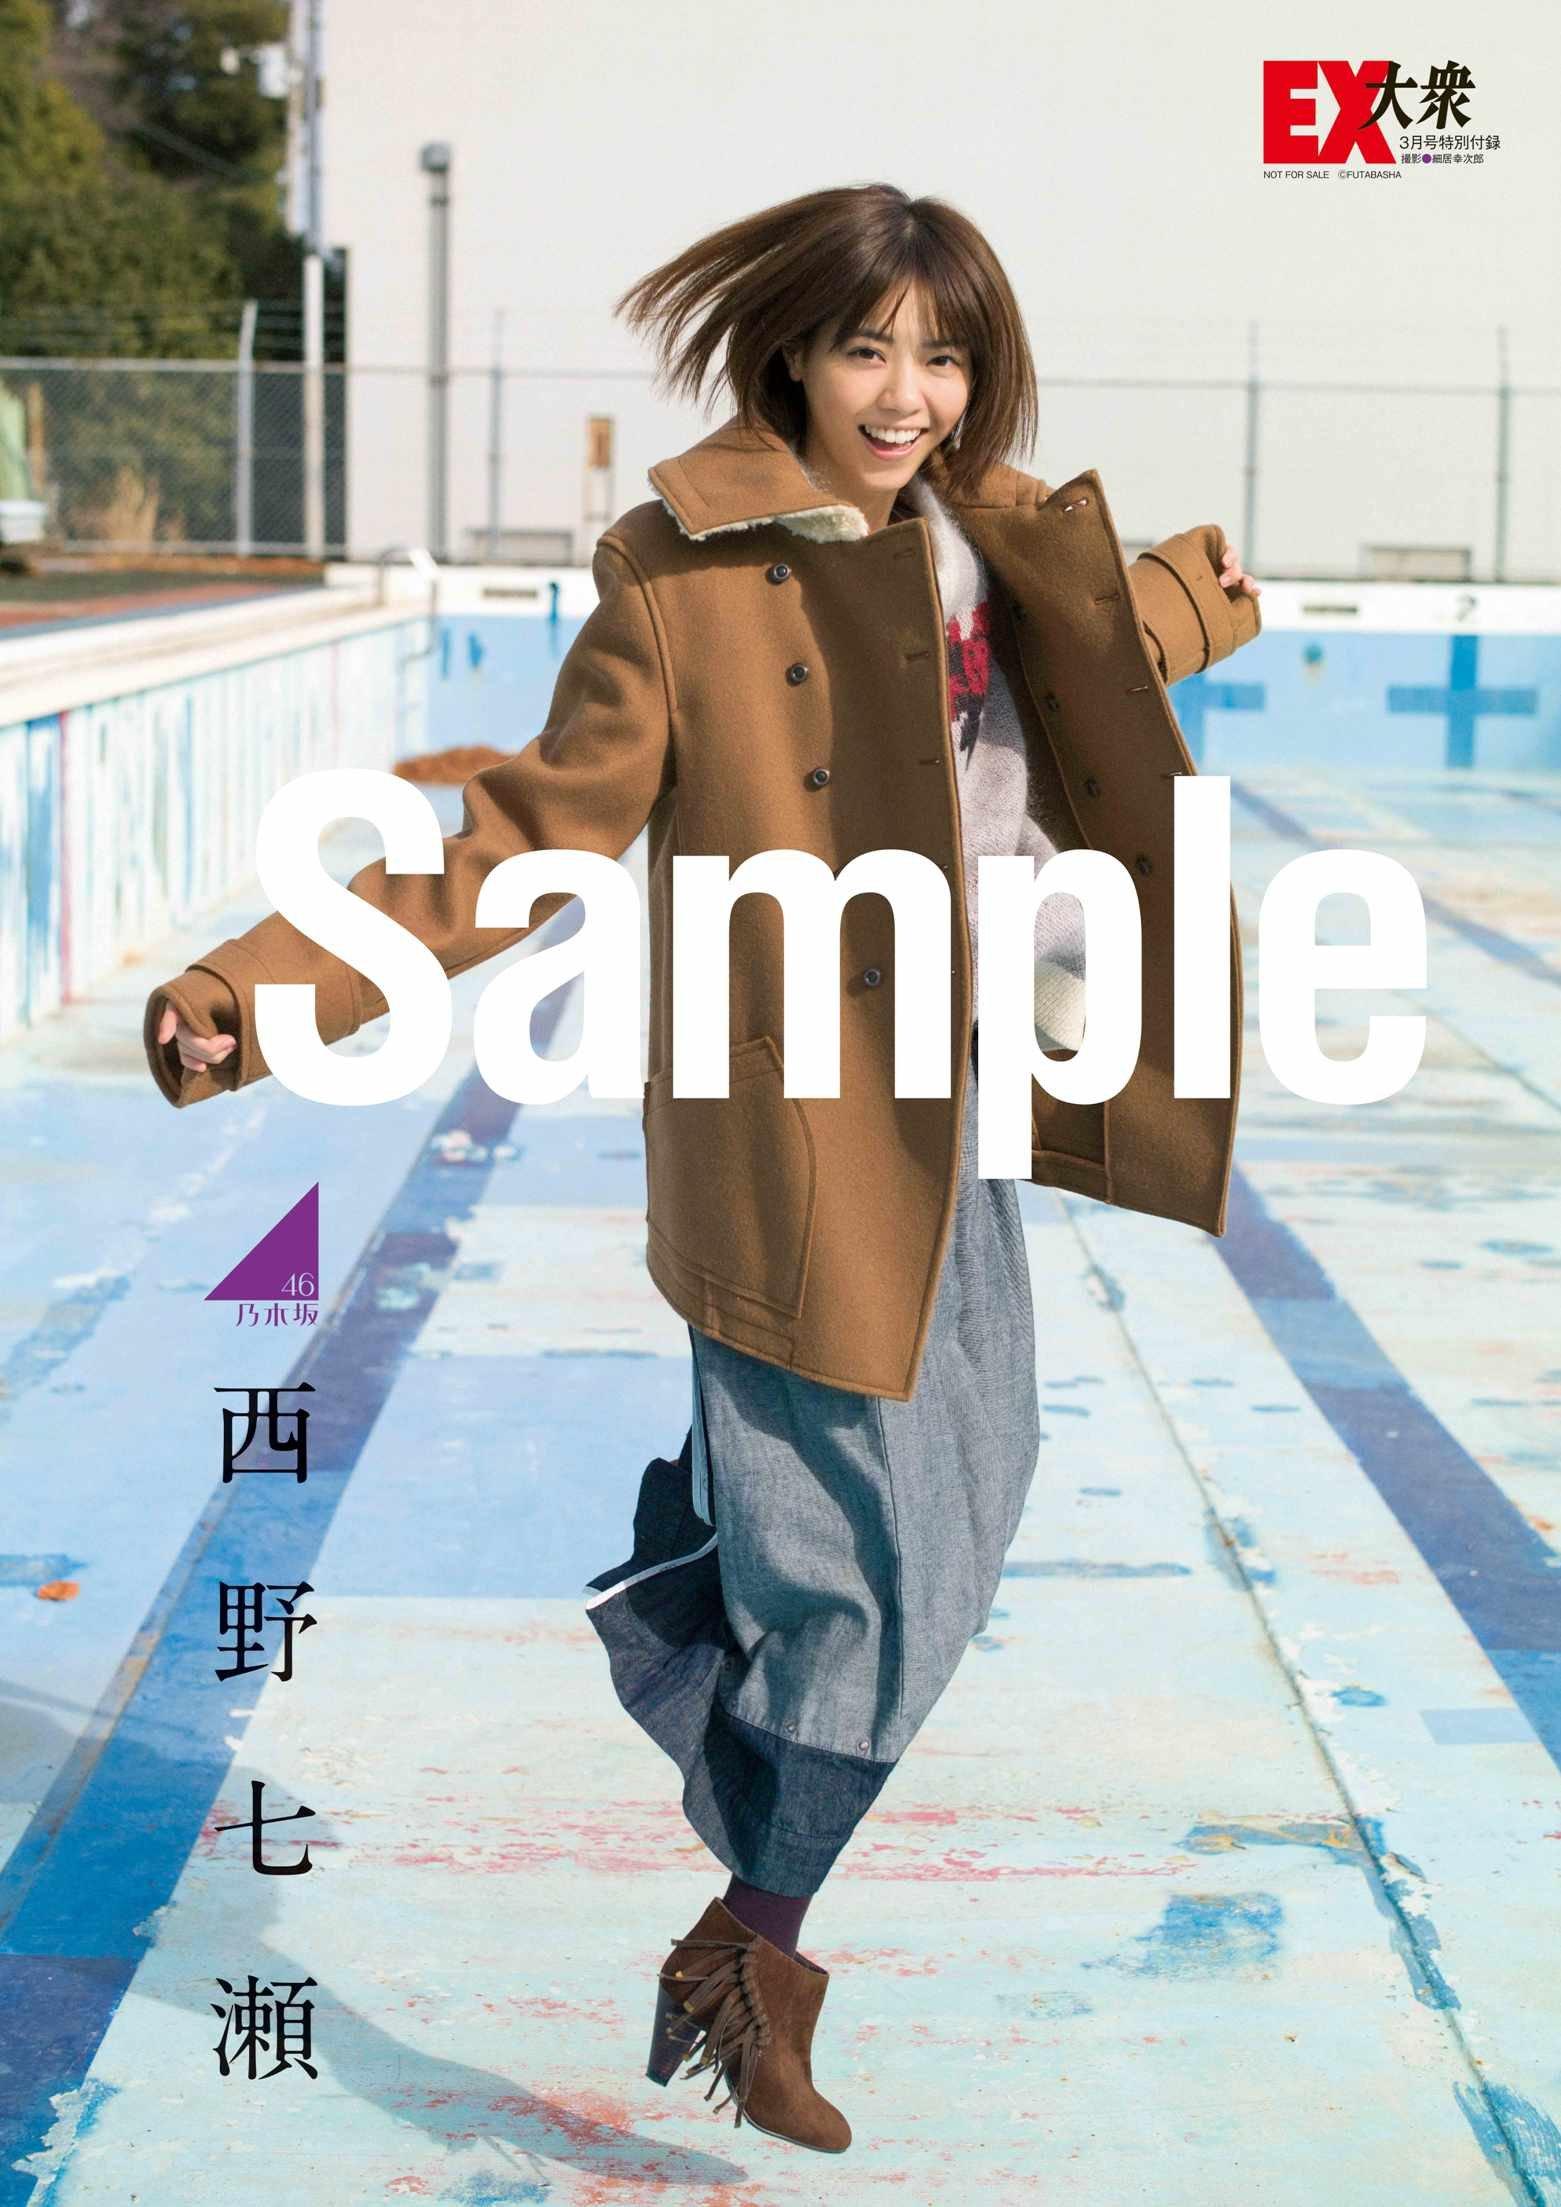 EX (イーエックス) 大衆 2018年3月号 西野七瀬3